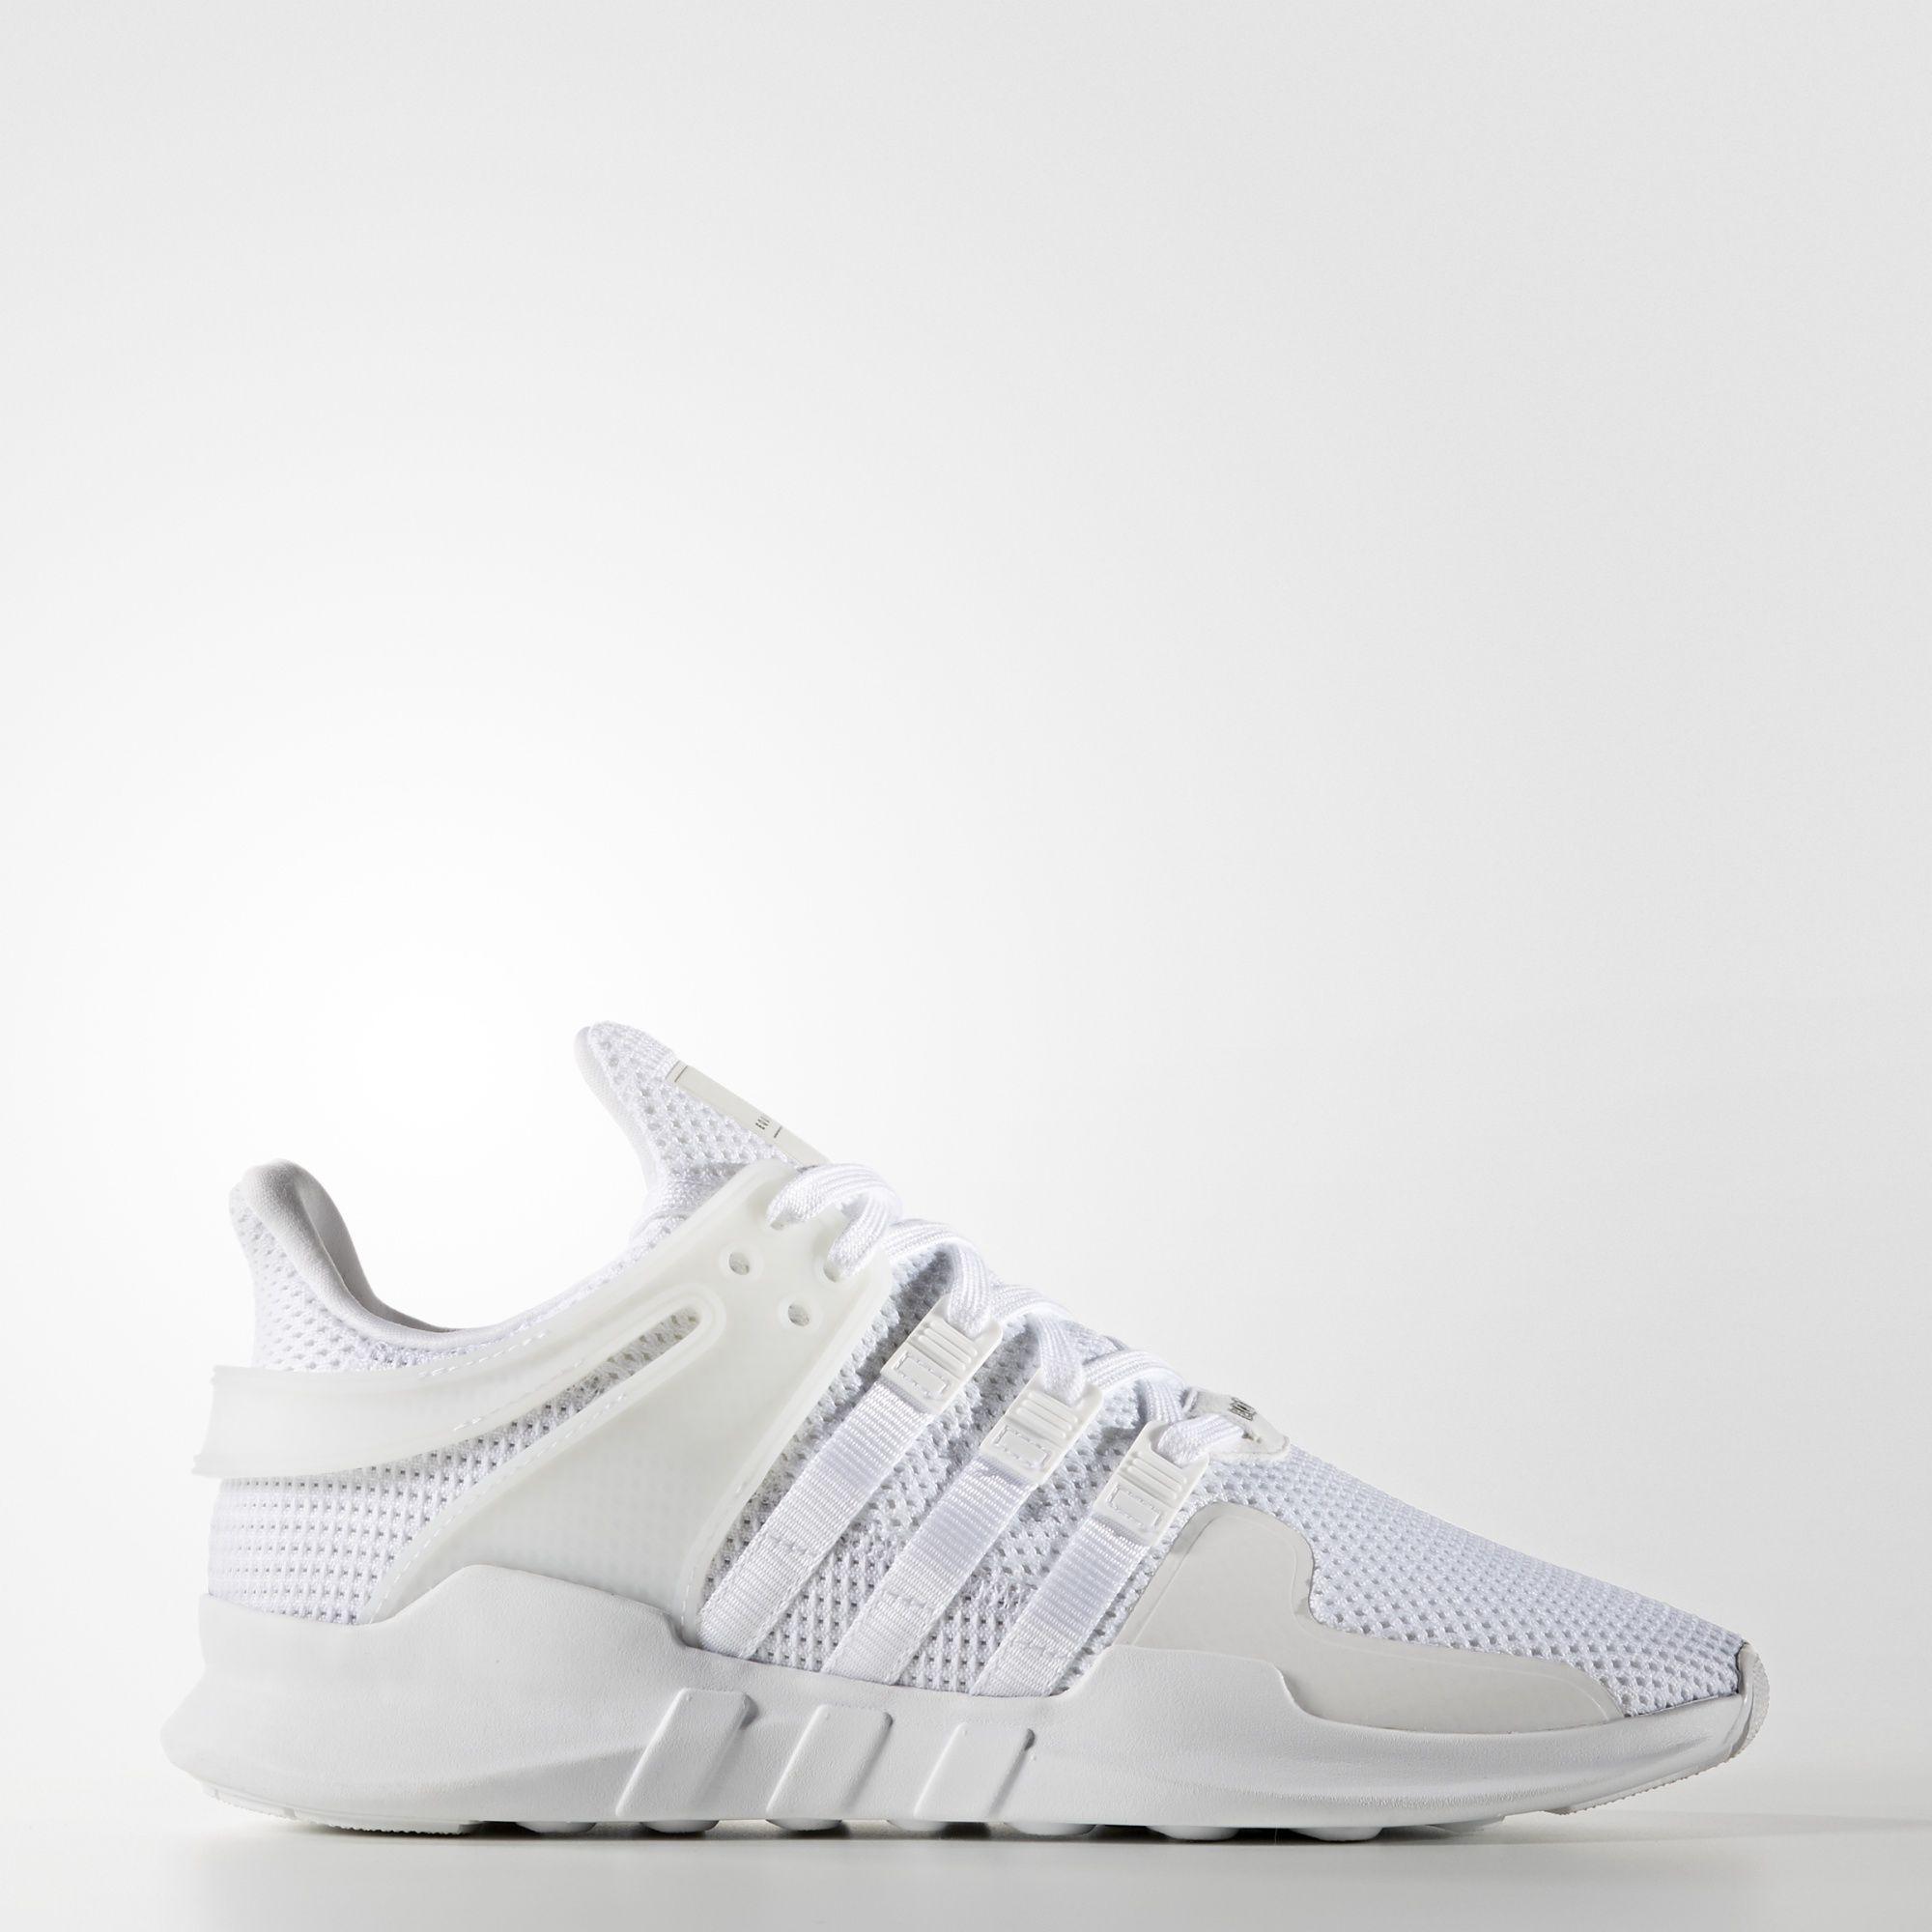 adidas originals men's eqt support adv fashion sneaker